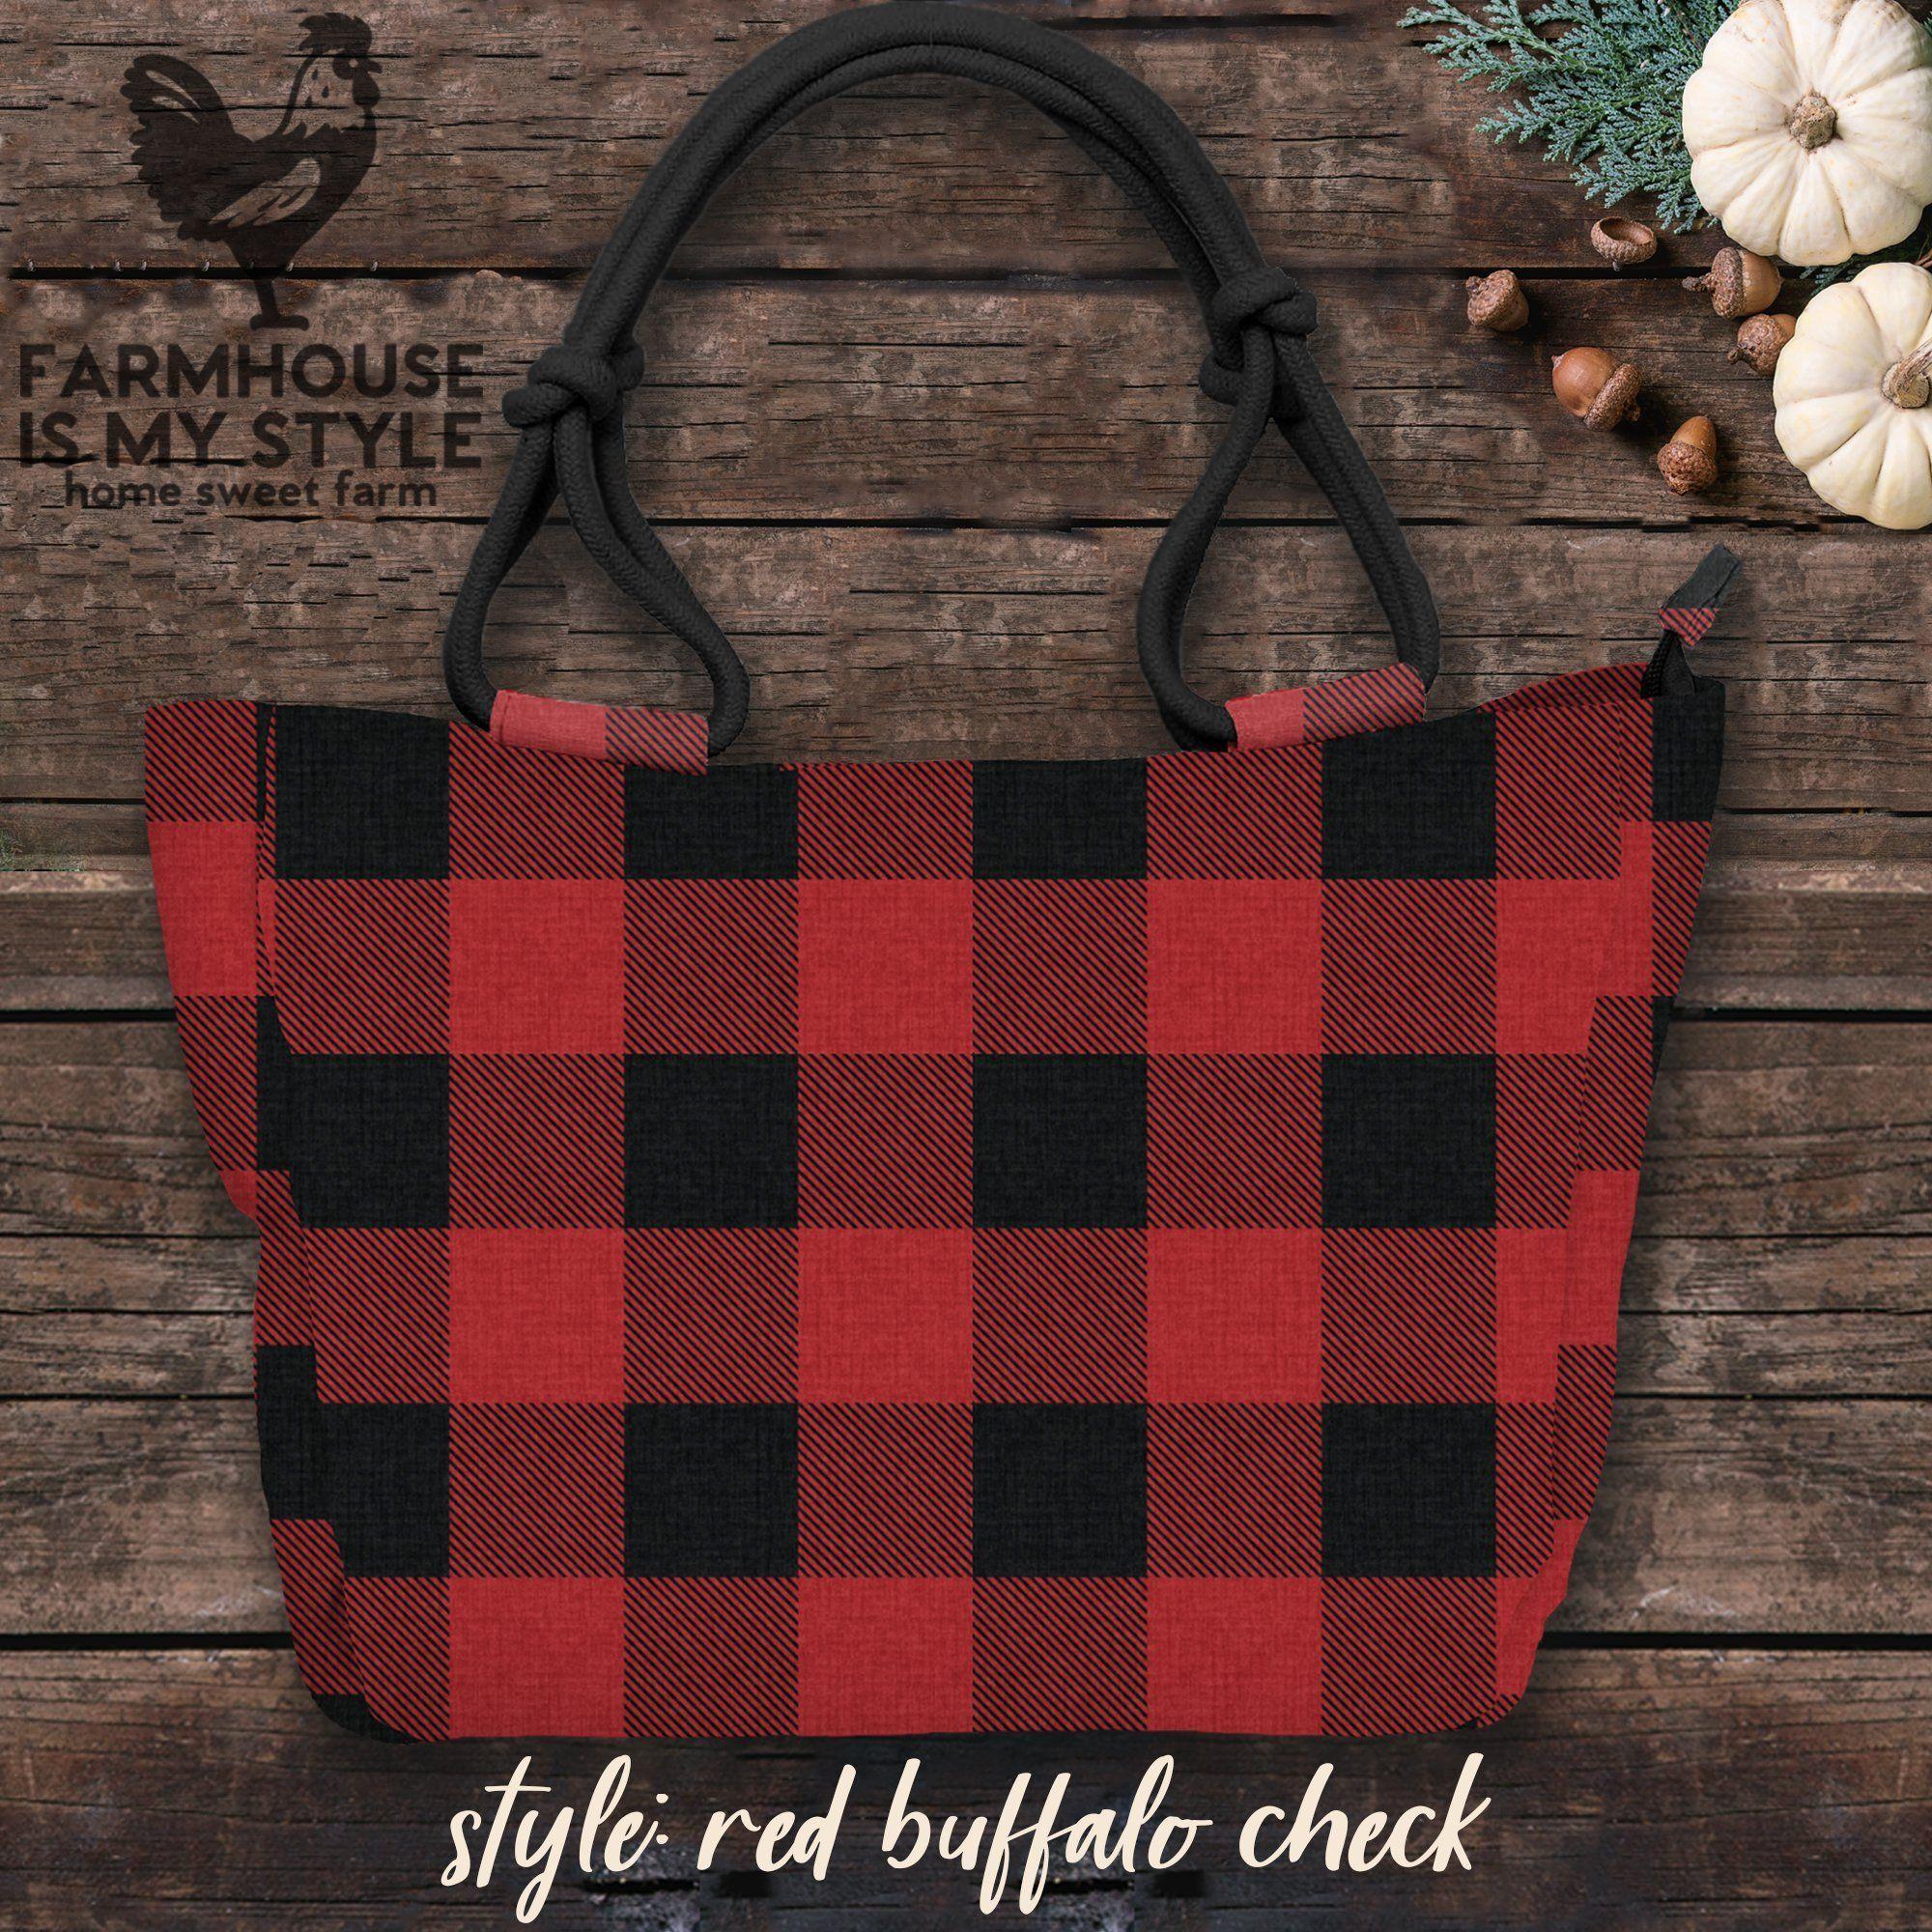 Just Released Fall / Winter Farmhouse Canvas Handbag